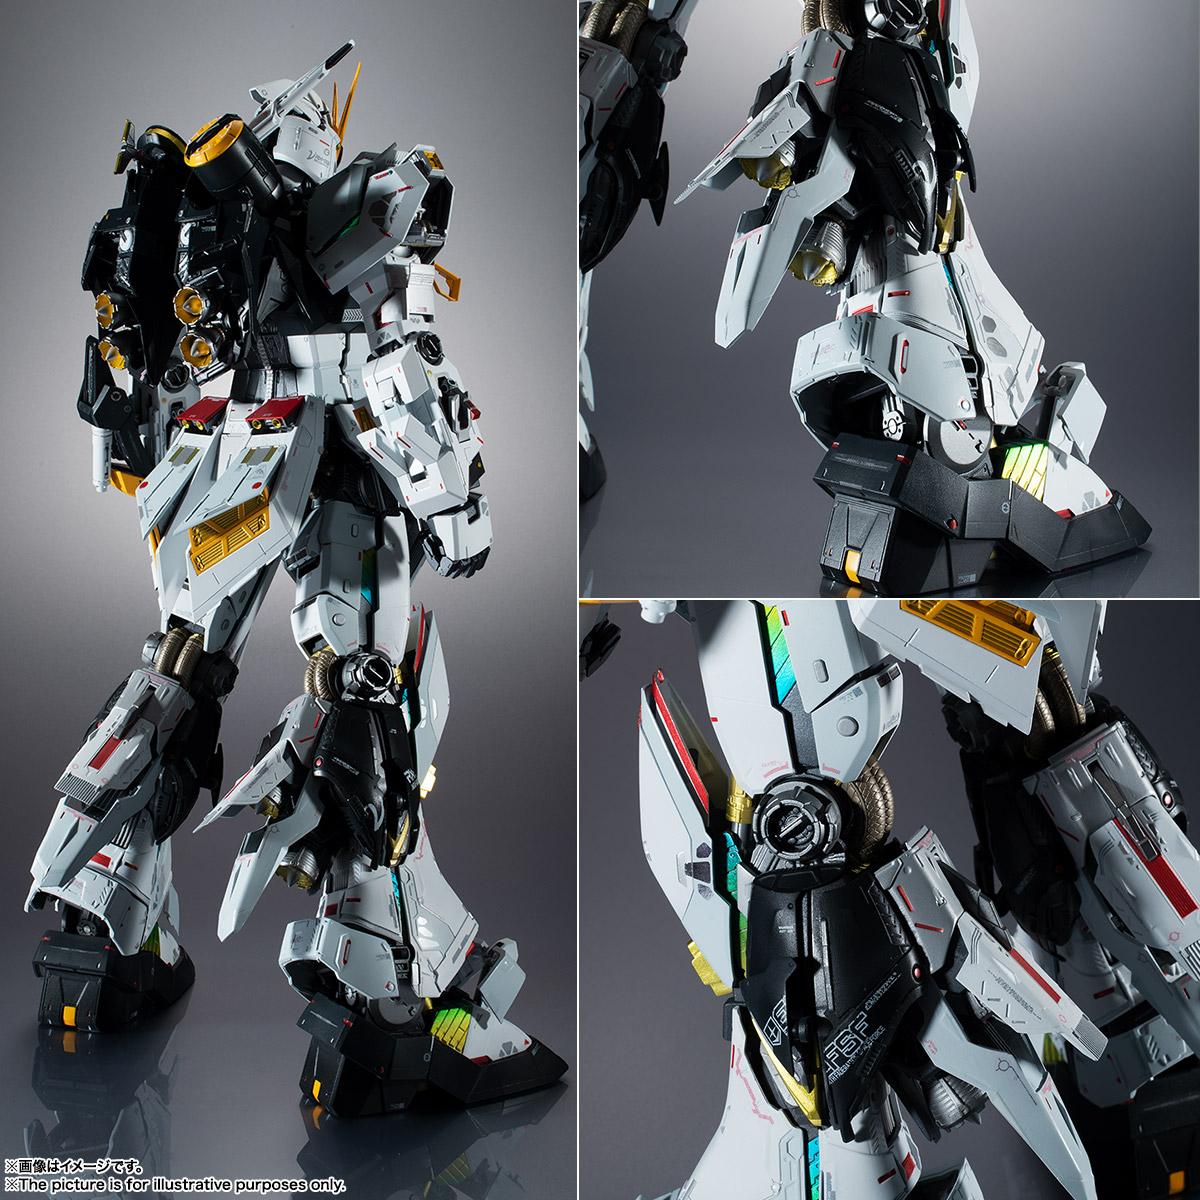 METAL STRUCTURE 解体匠機『RX-93 νガンダム』可動フィギュア-012